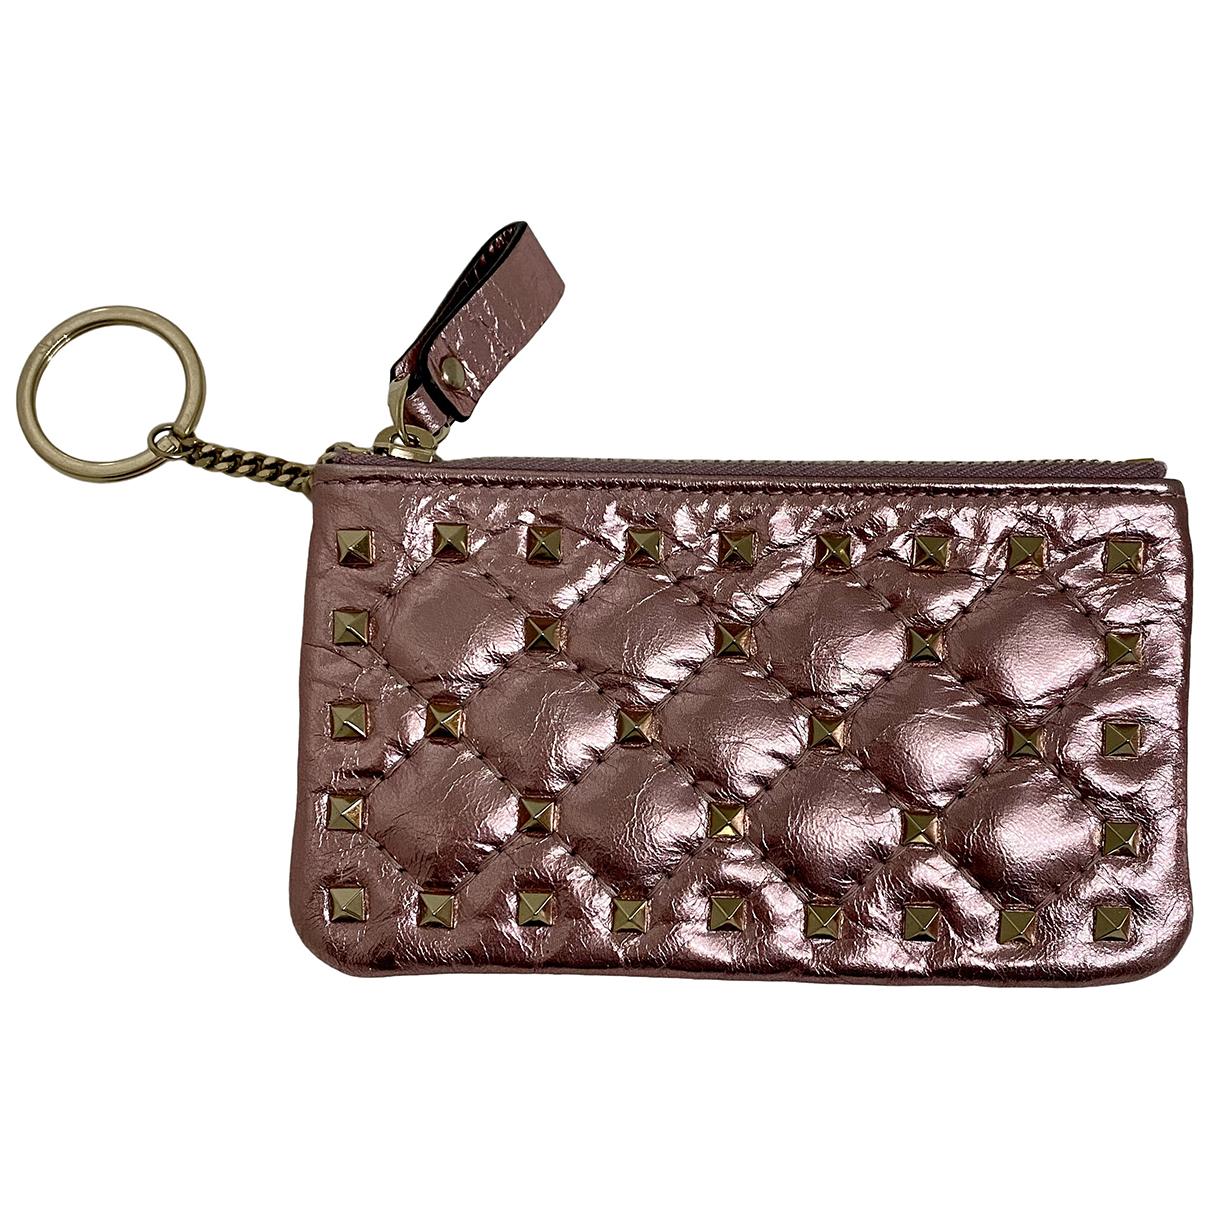 Valentino Garavani N Pink Leather Purses, wallet & cases for Women N